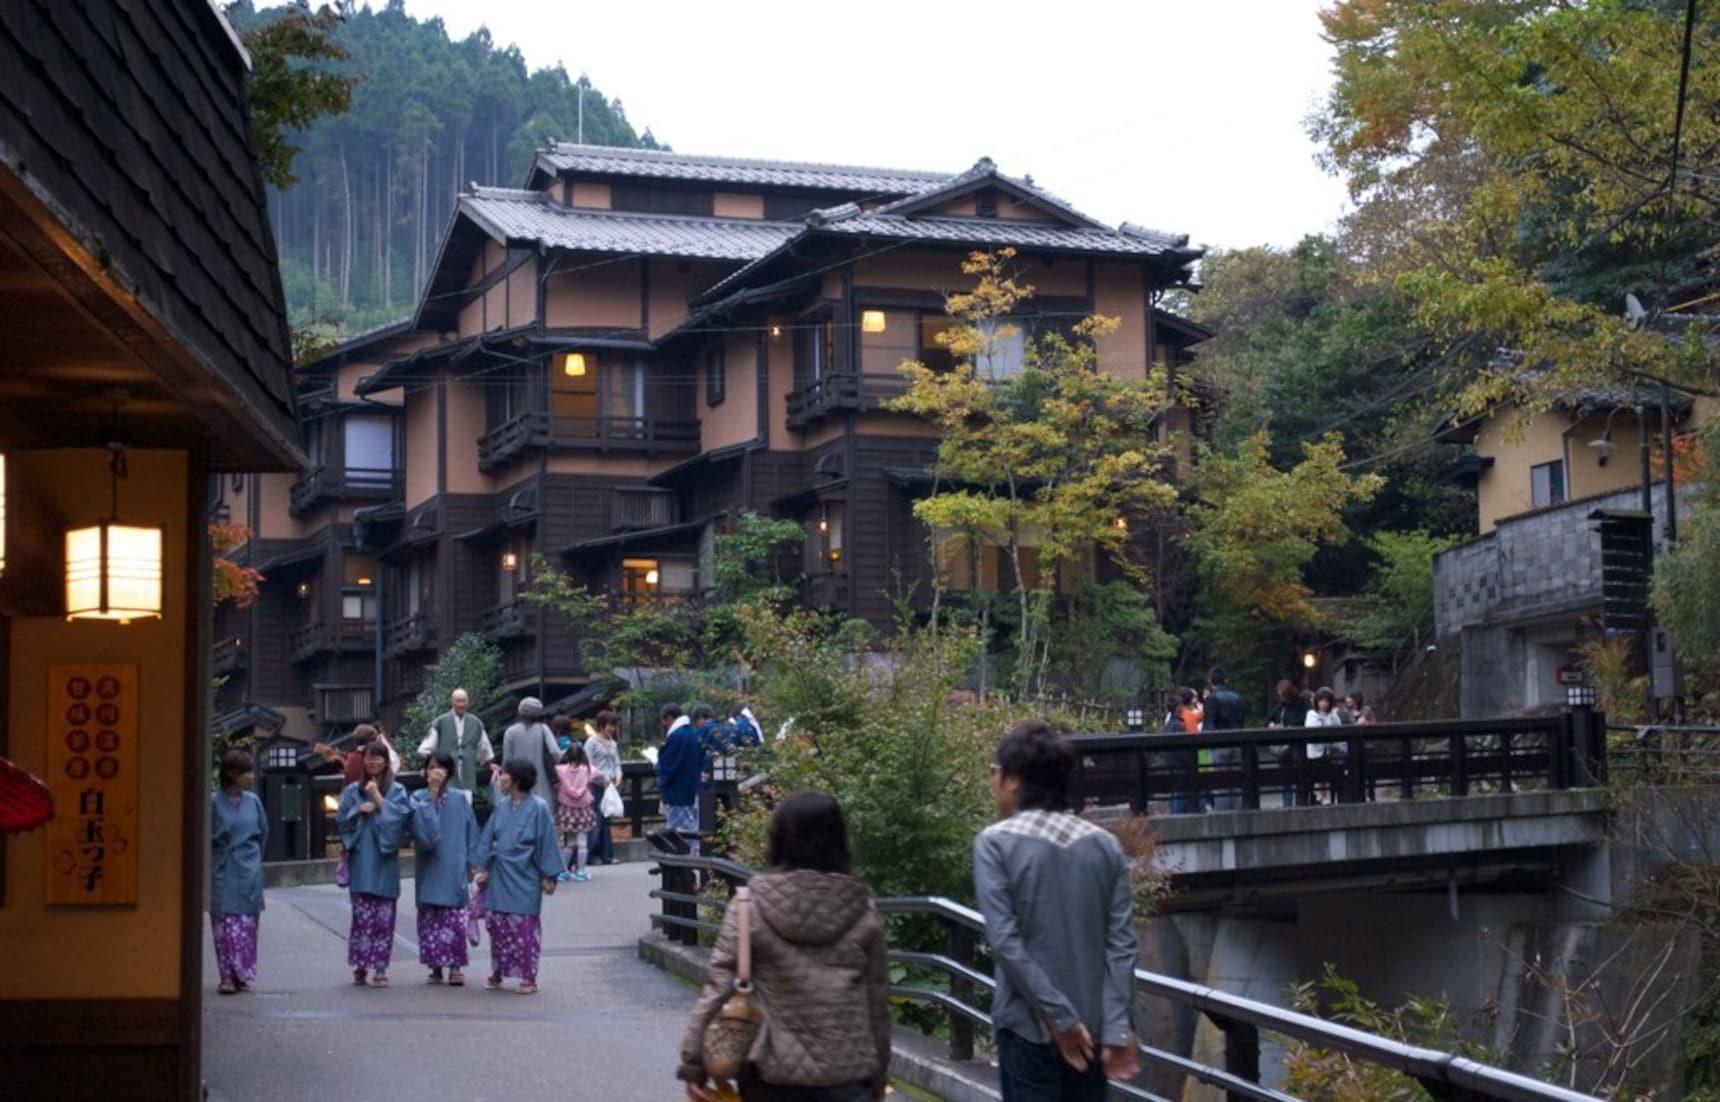 6 Boutique Ryokan สวยหรู ใกล้ชิดธรรมชาติ